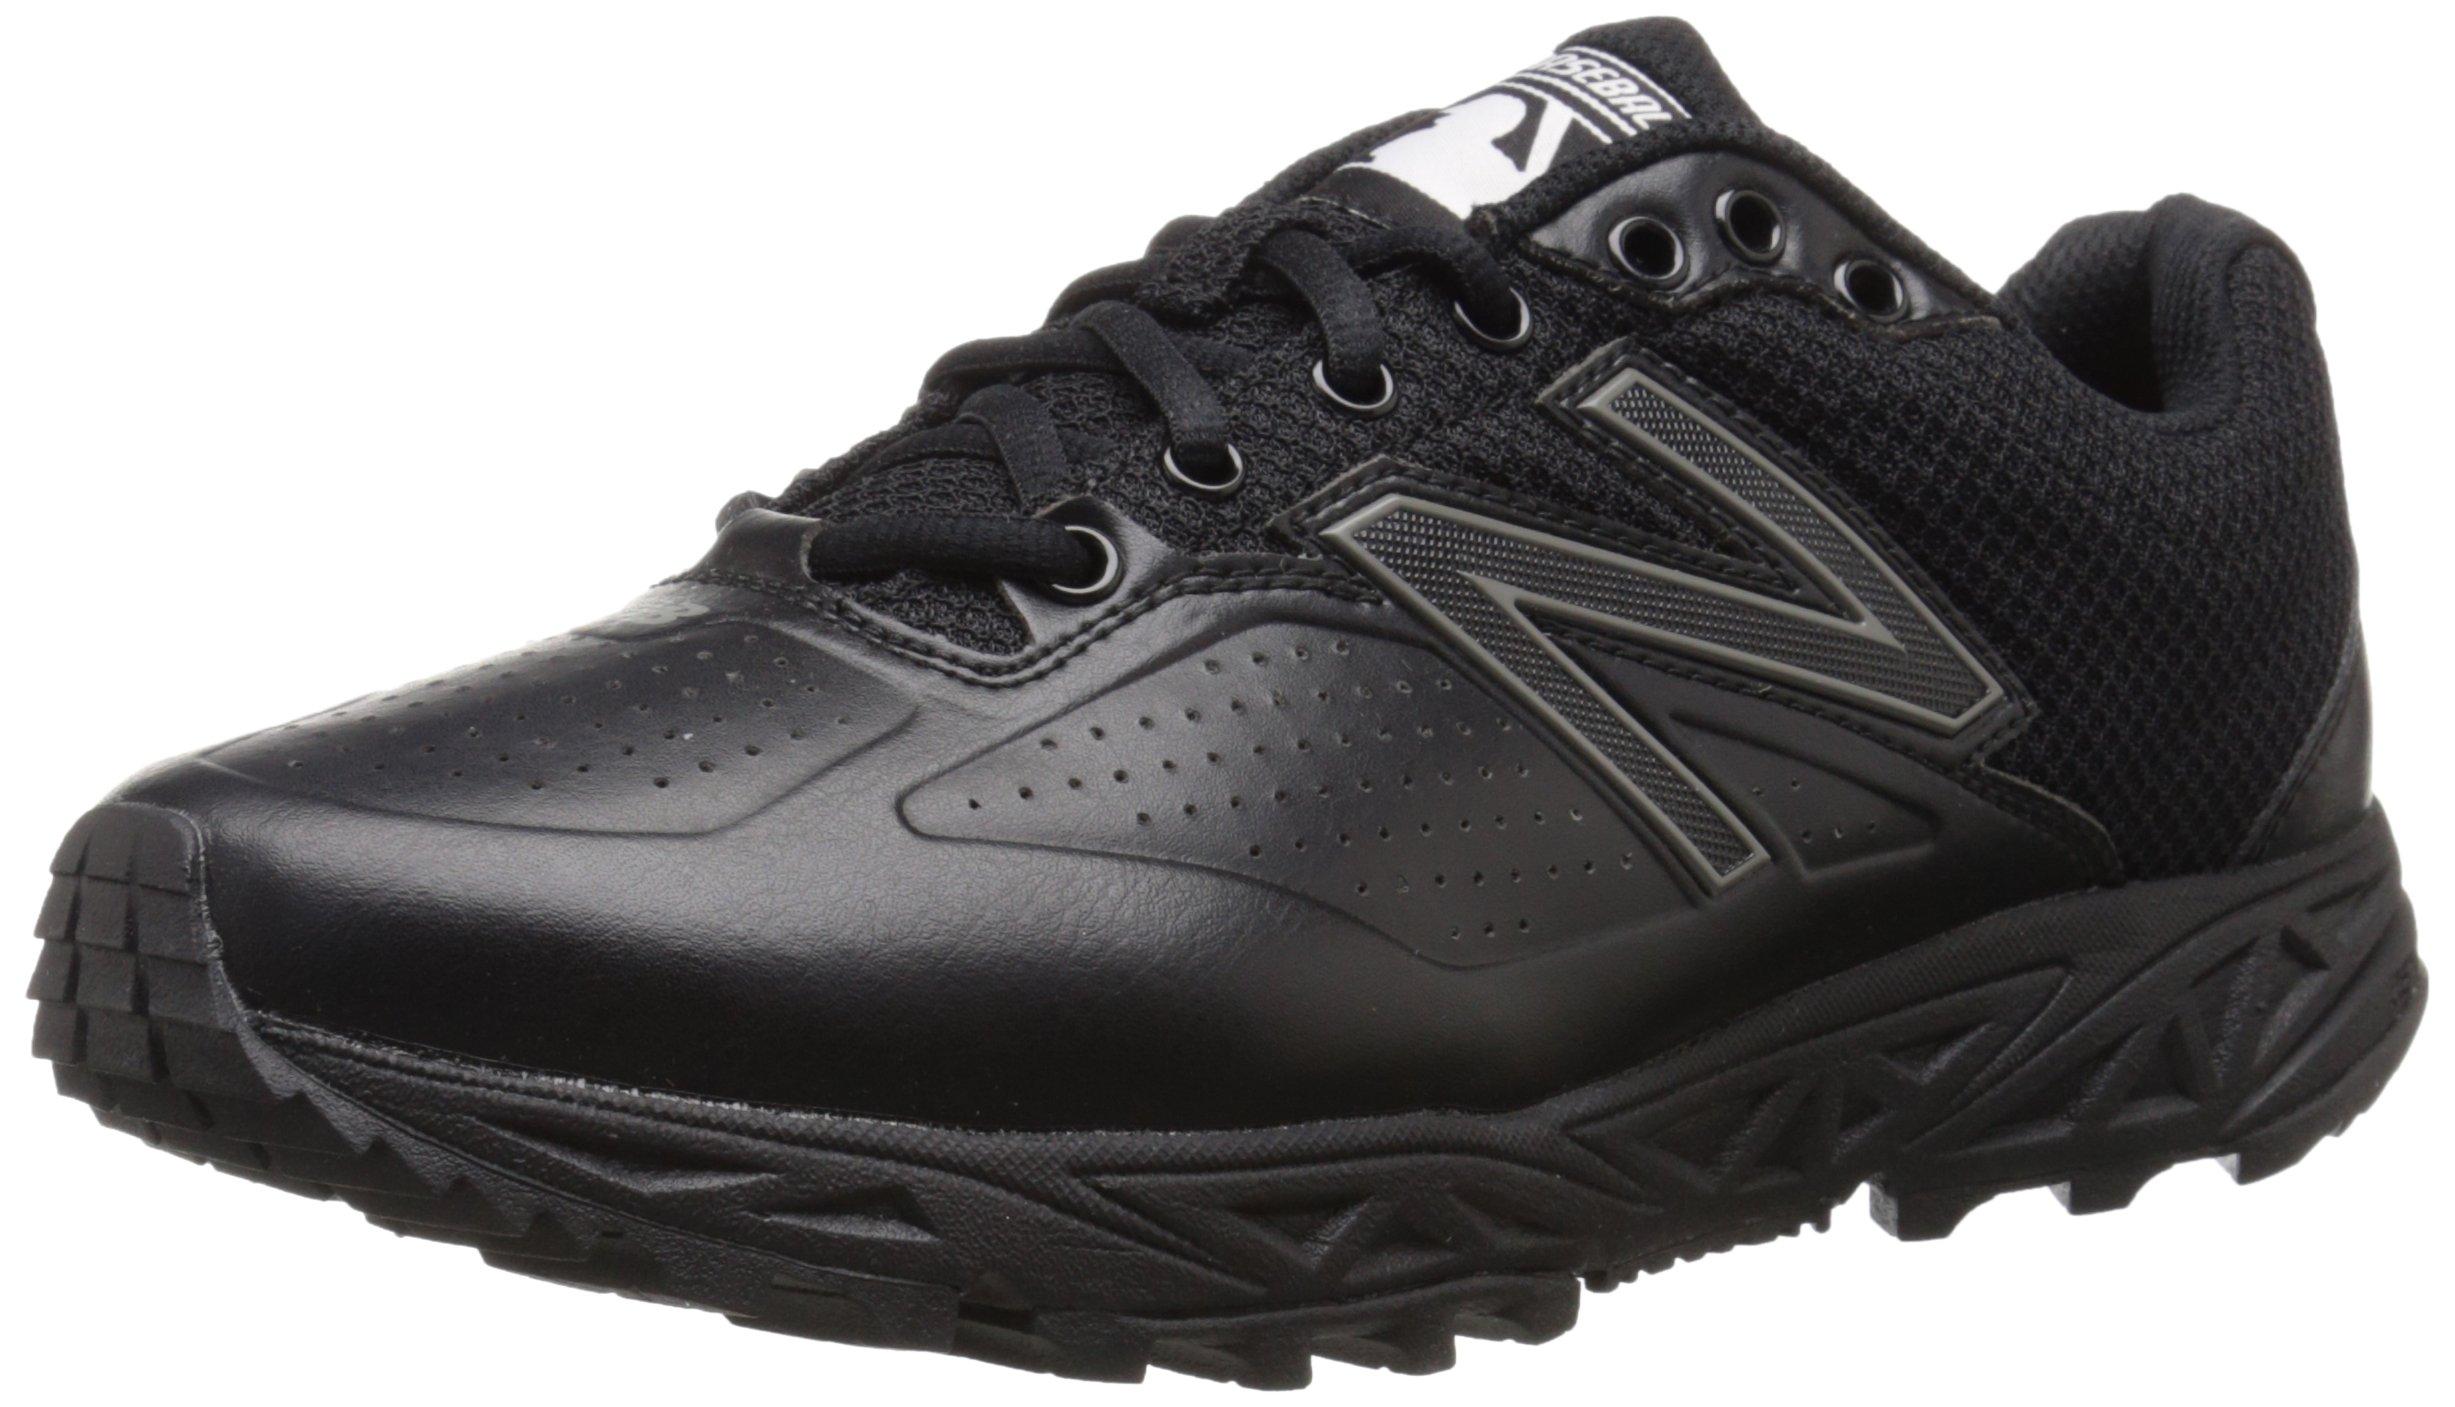 New Balance Men's MU950V2 Umpire Low Shoe, Black, 11 D US by New Balance